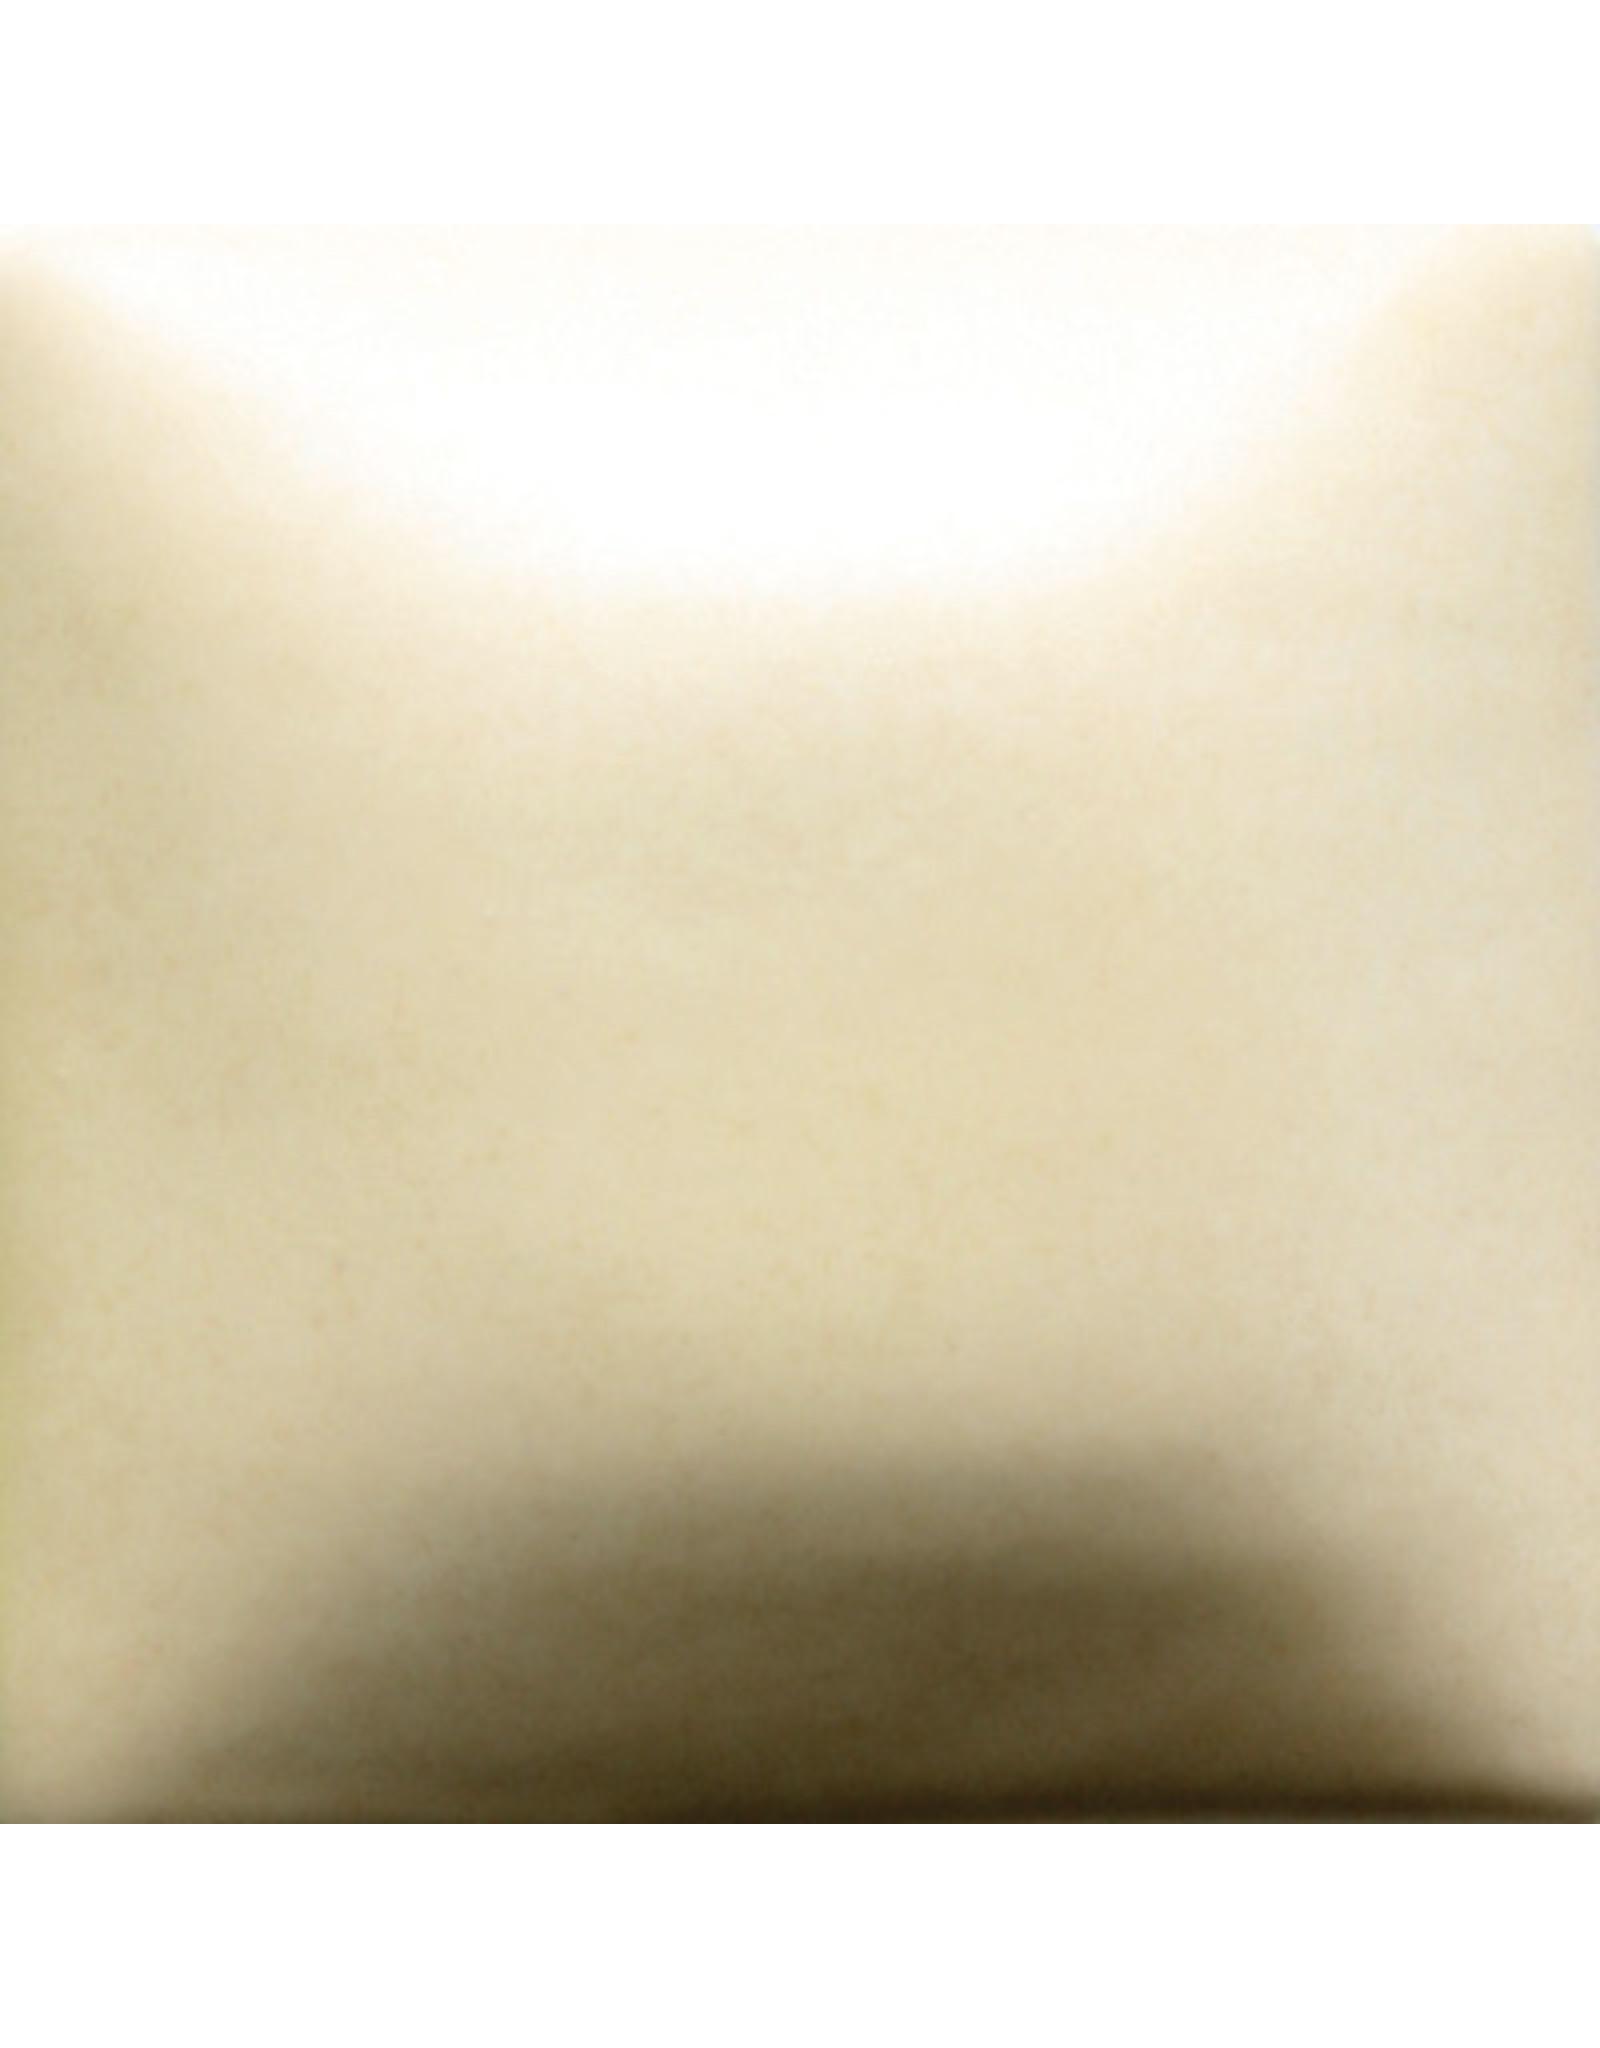 Mayco Mayco Foundations Matte Ivory Cream 118ml